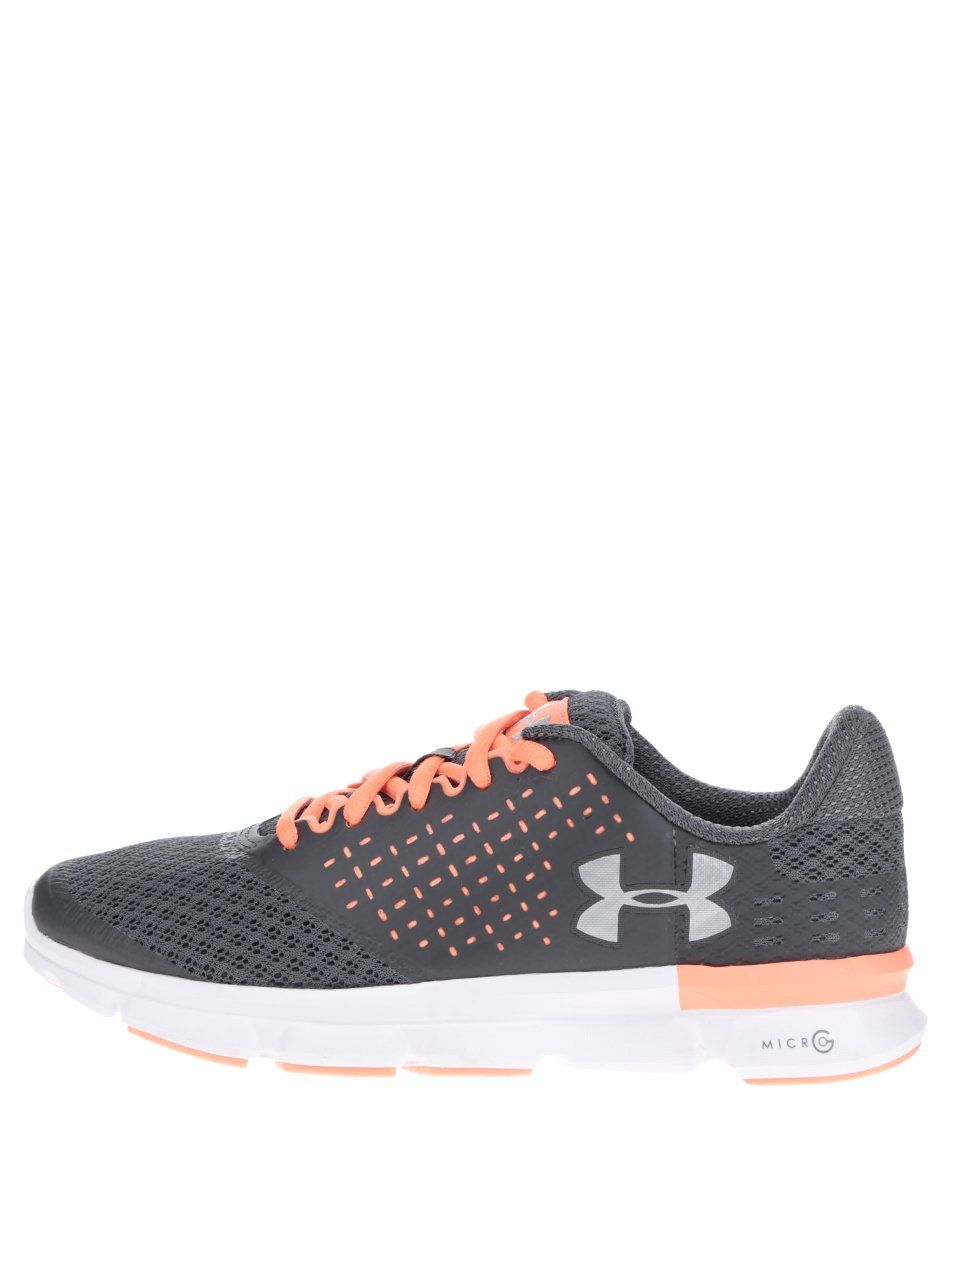 Oranžovo-šedé dámské tenisky Under Armour UA W Micro G Speed Swift 2 2289 Kč 5bd26676c7